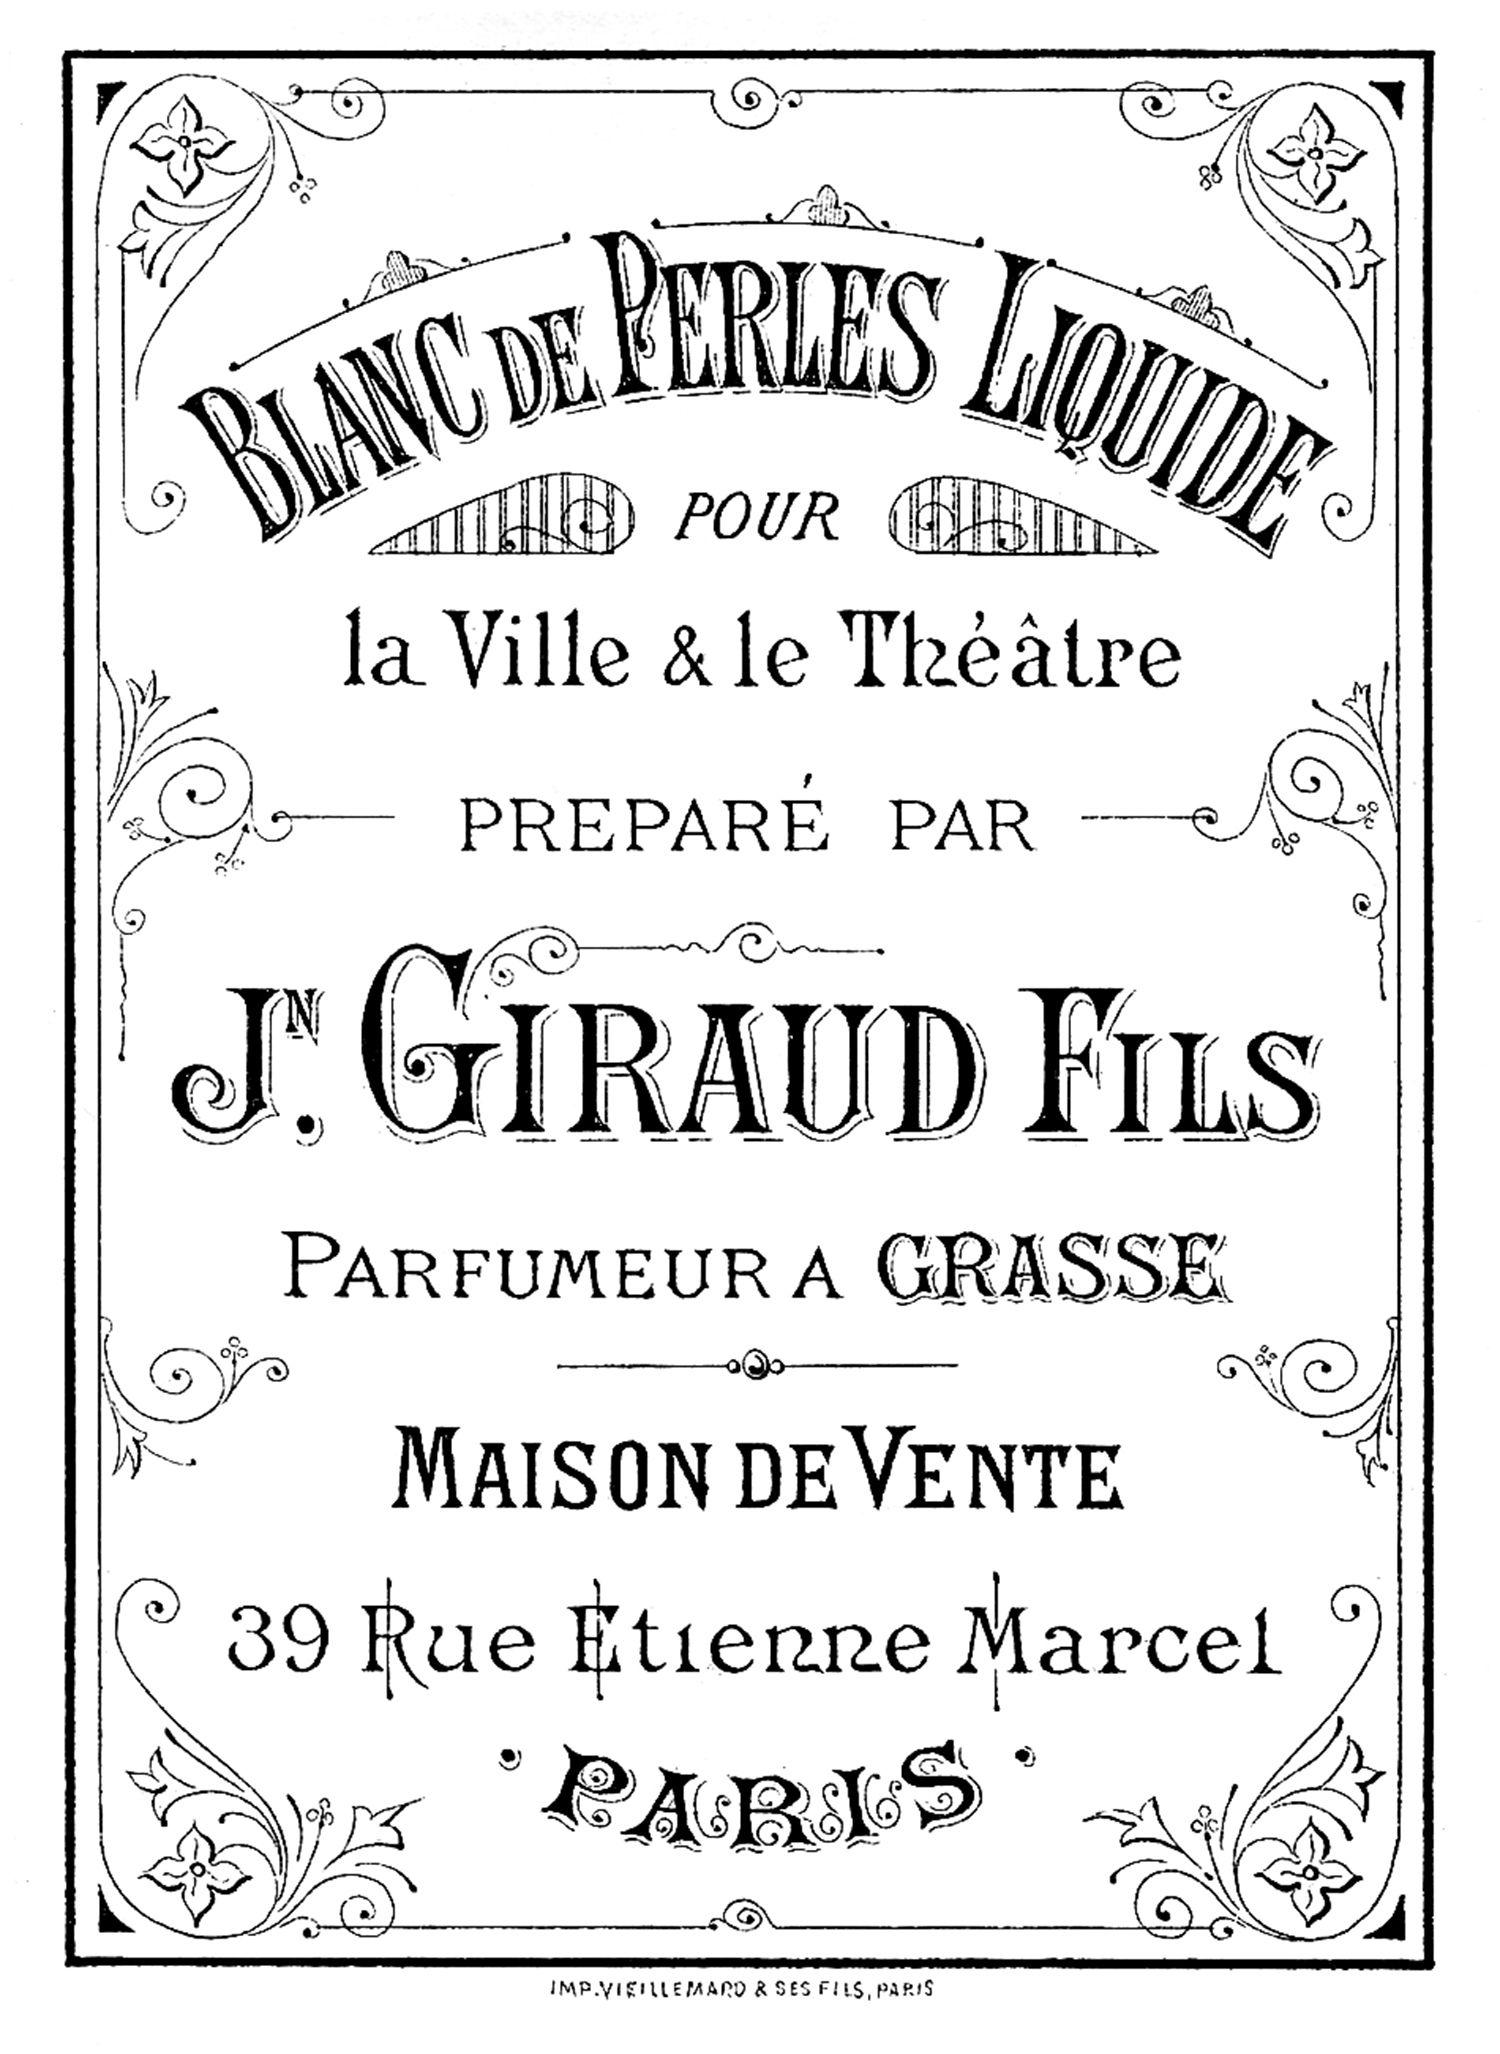 Vintage Perfume Label Image